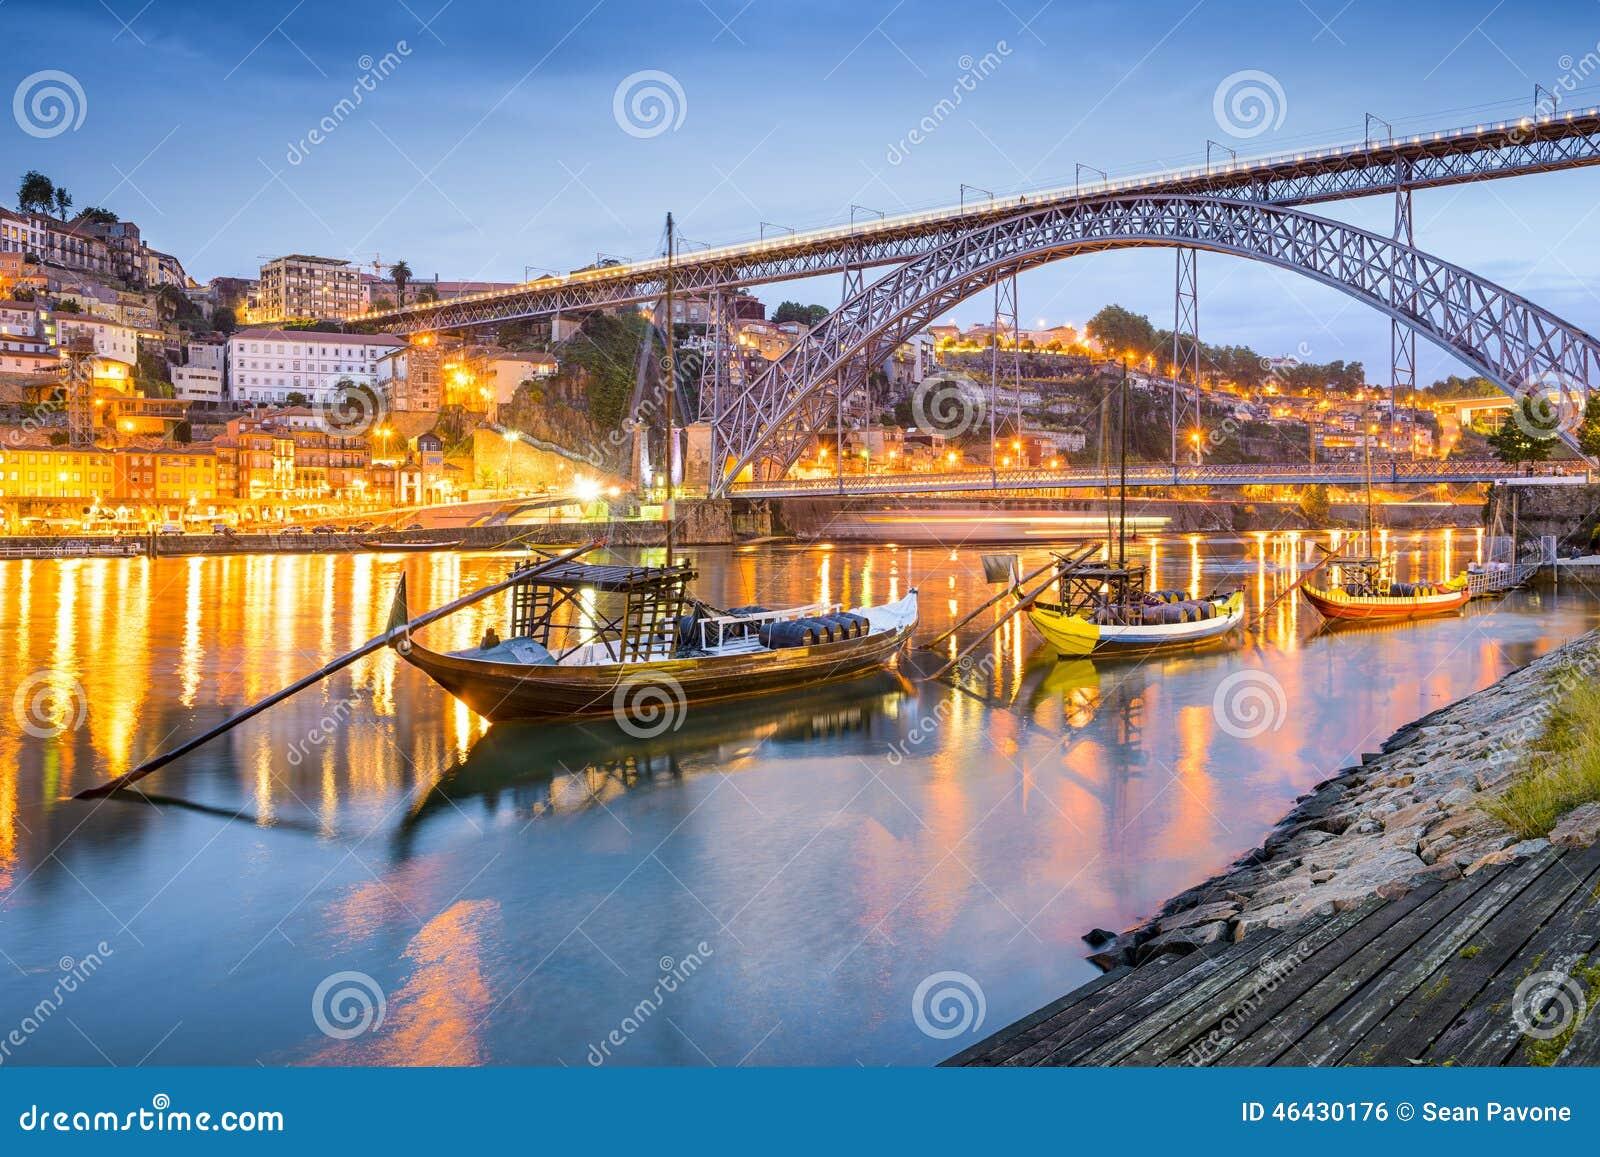 portugal paysage - Image